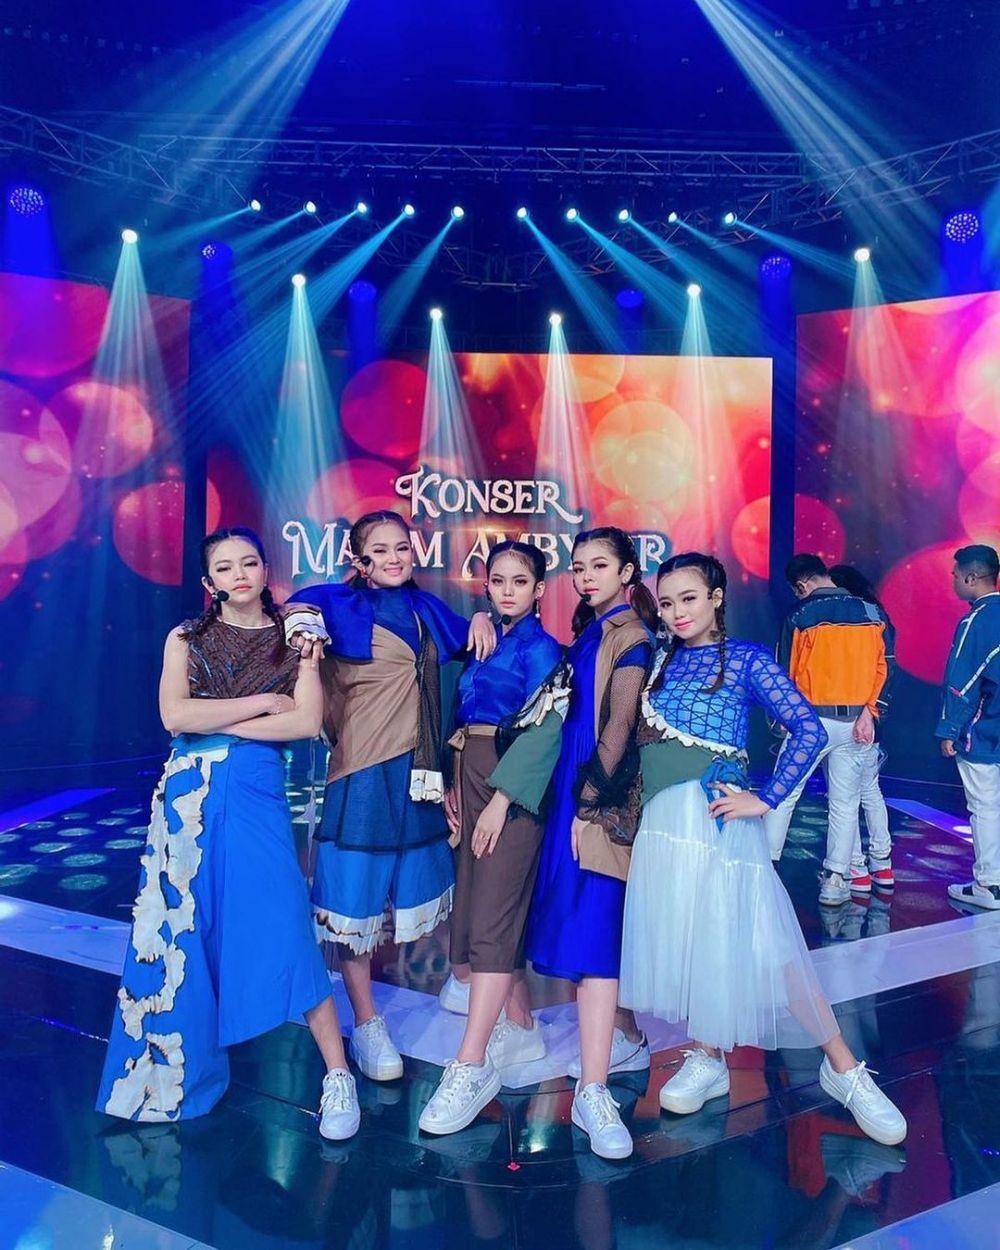 Potret girlband dangdut Byoode © 2020 brilio.net